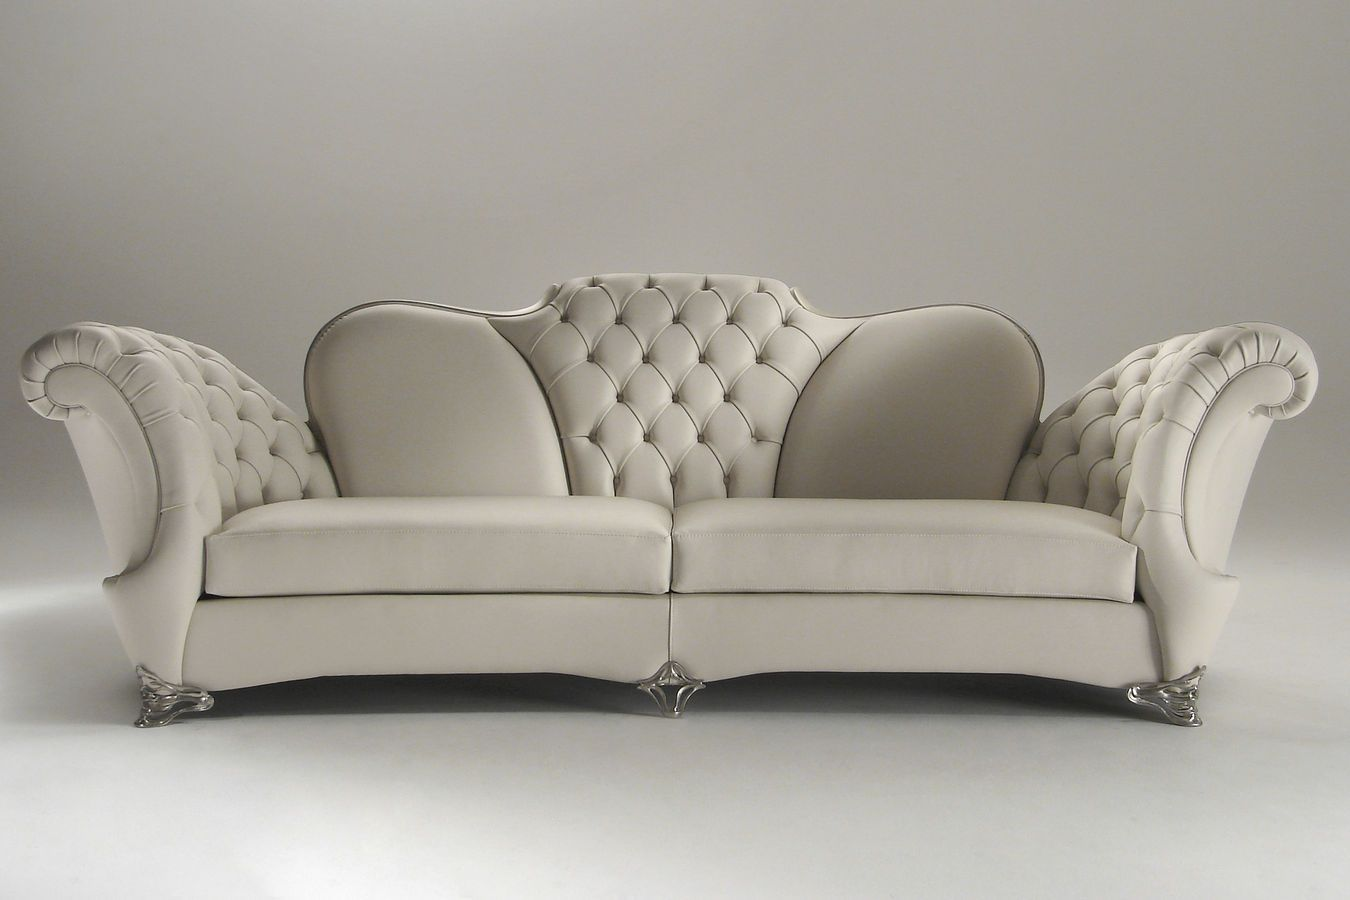 Divano in stile florindo mantellassi диван pinterest